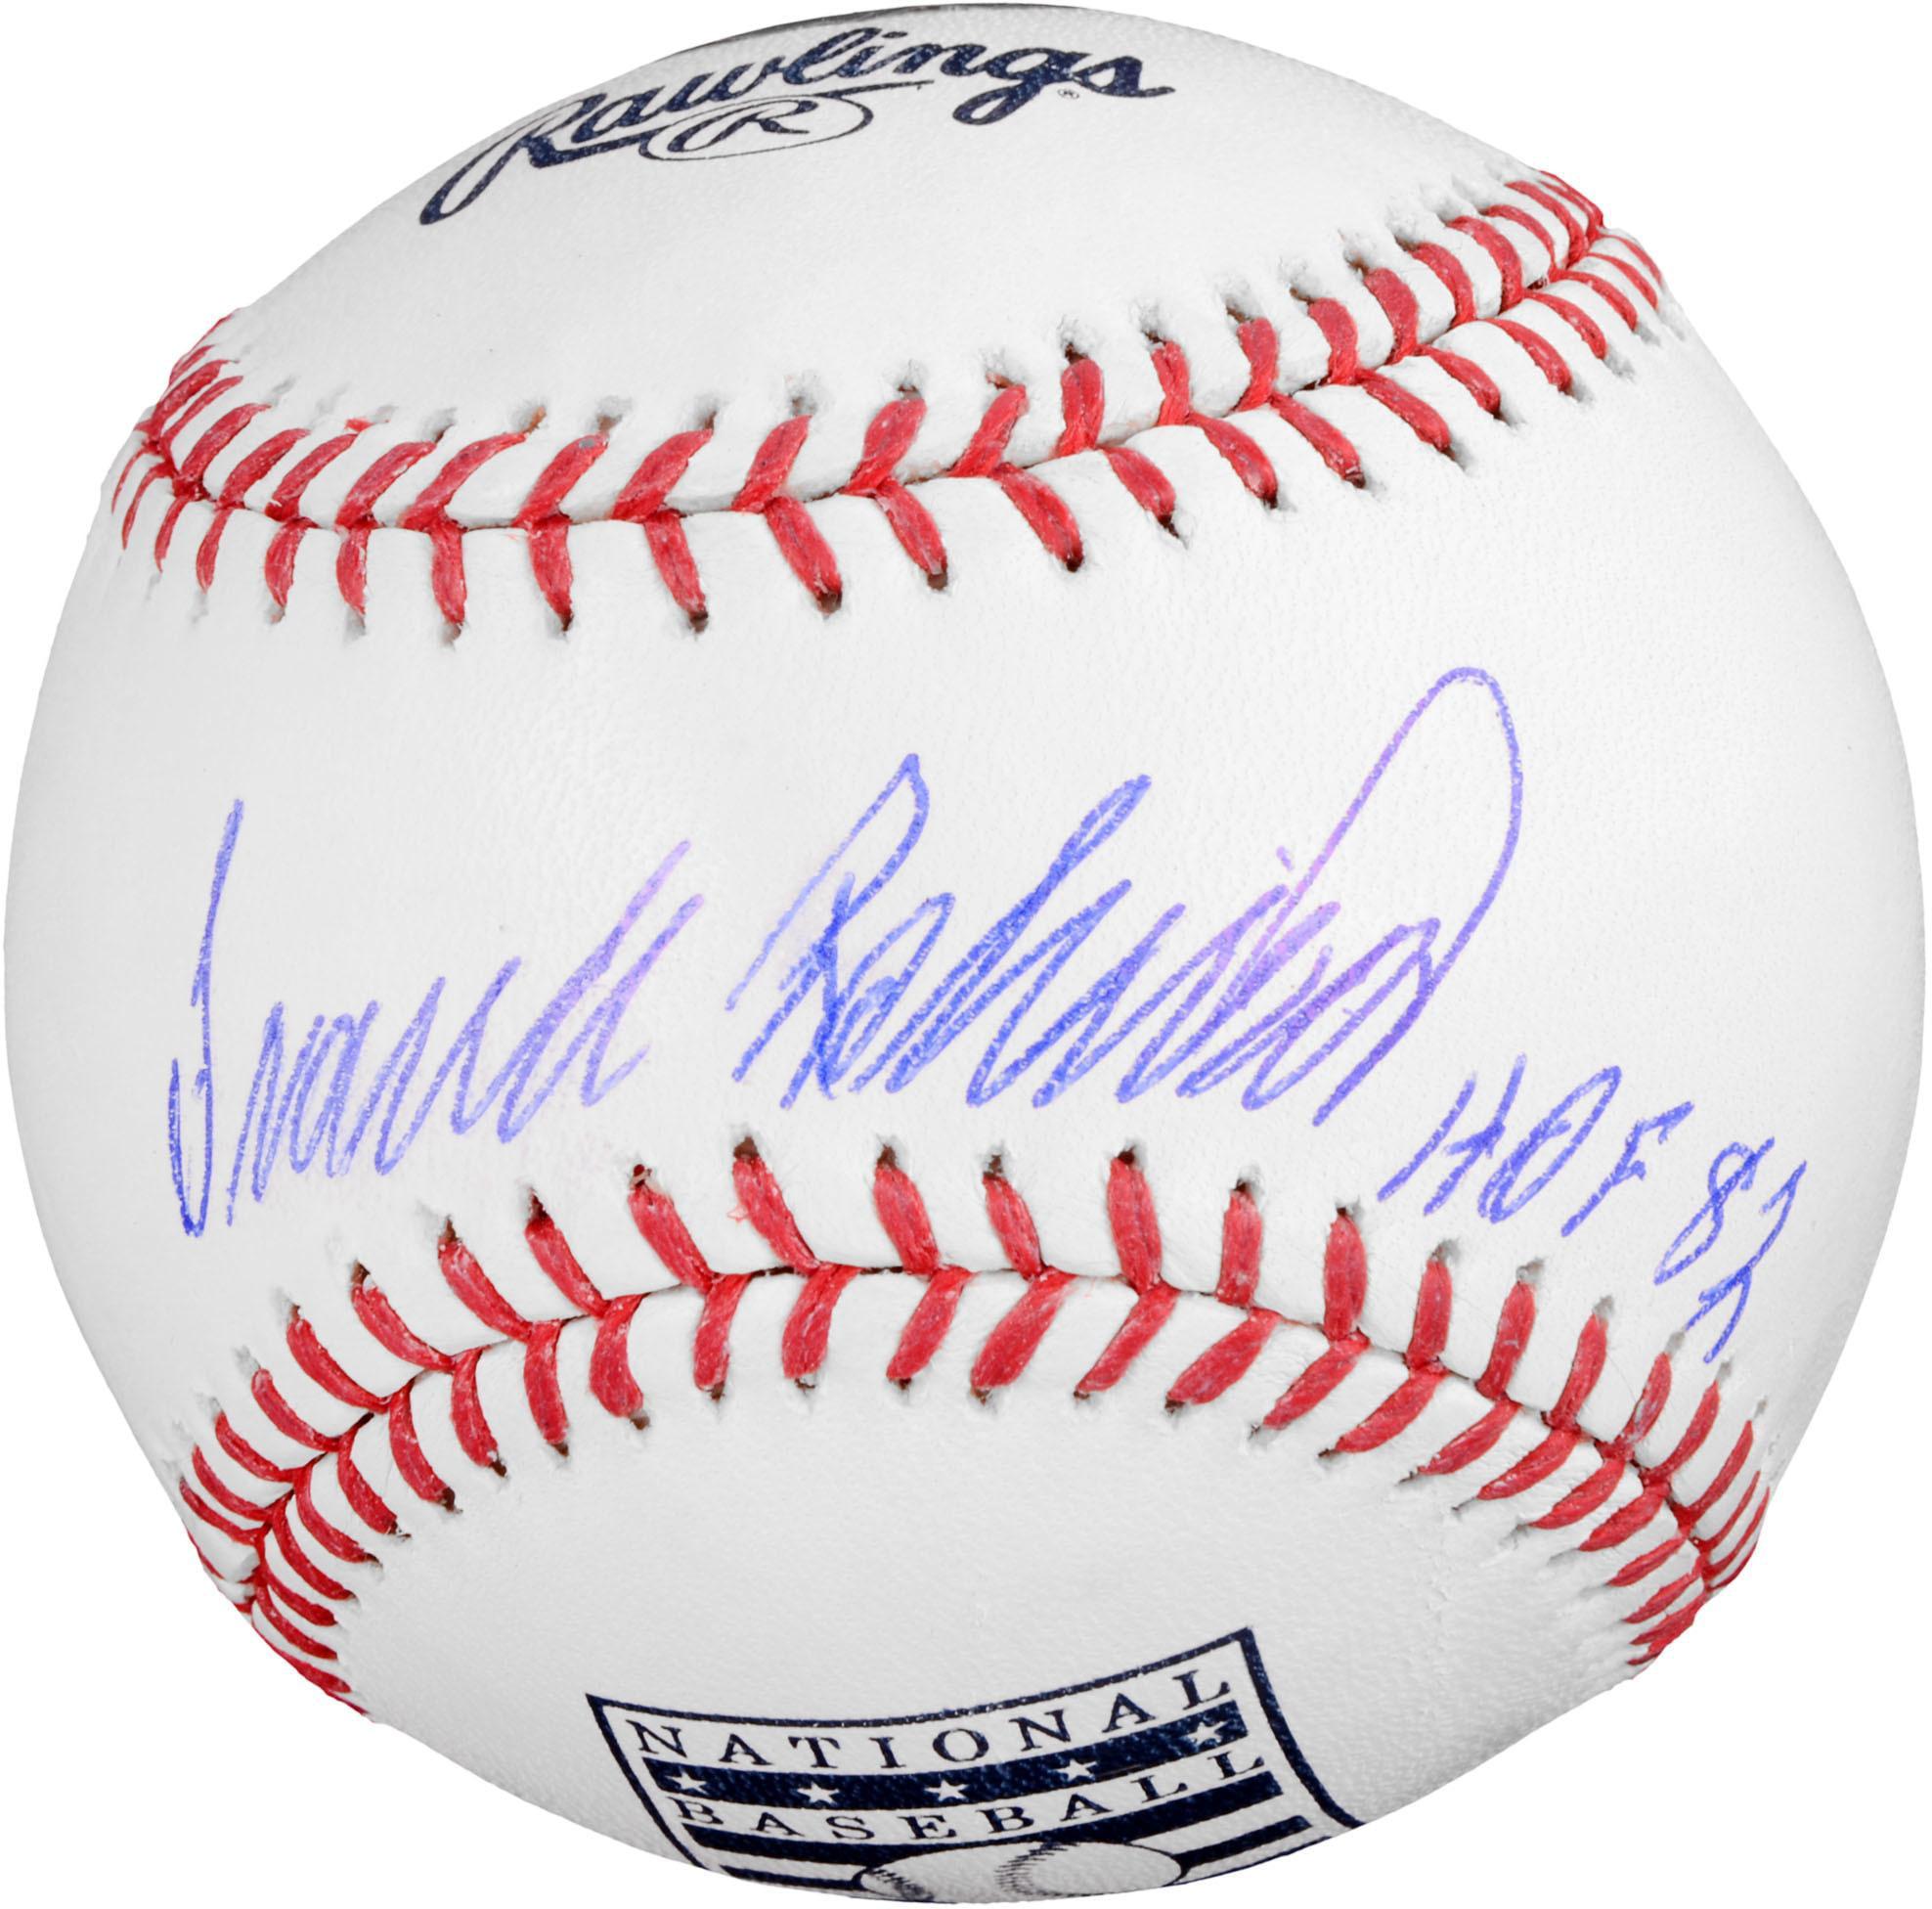 Frank Robinson Baltimore Orioles Autographed HOF Logo Baseball with HOF 82 Inscription - Fanatics Authentic Certified